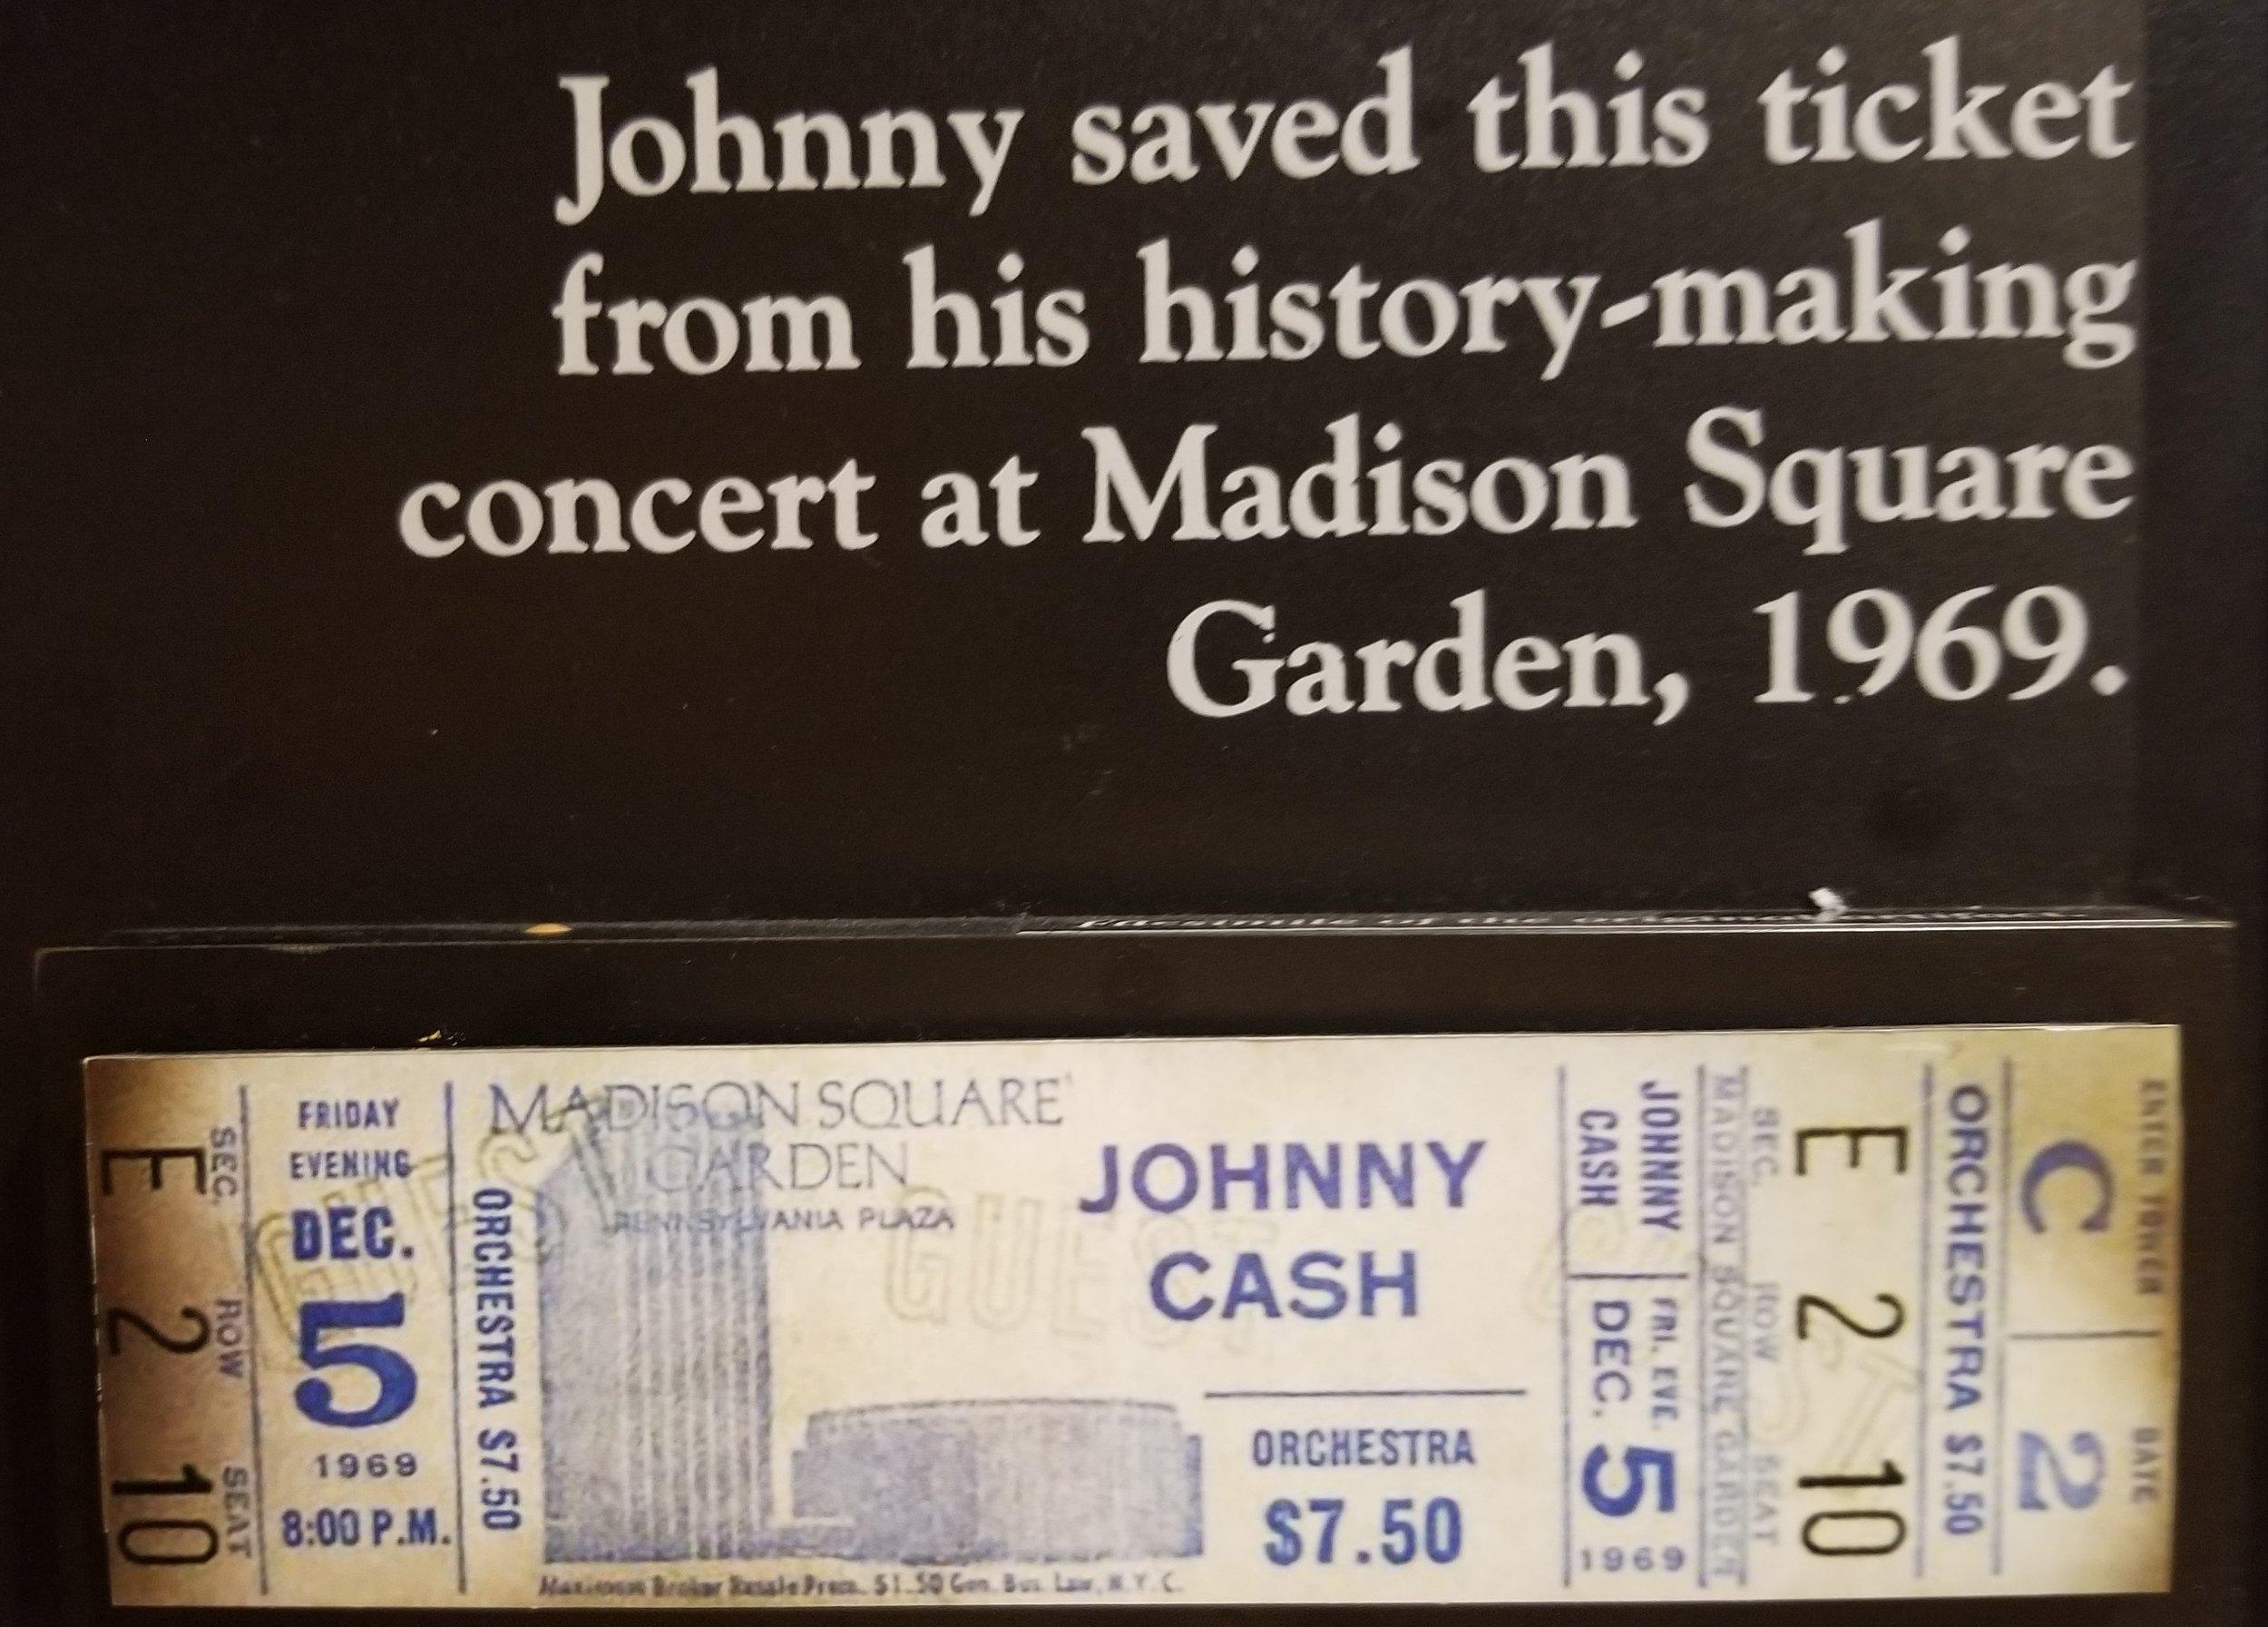 1969 Johnny Cash ticket